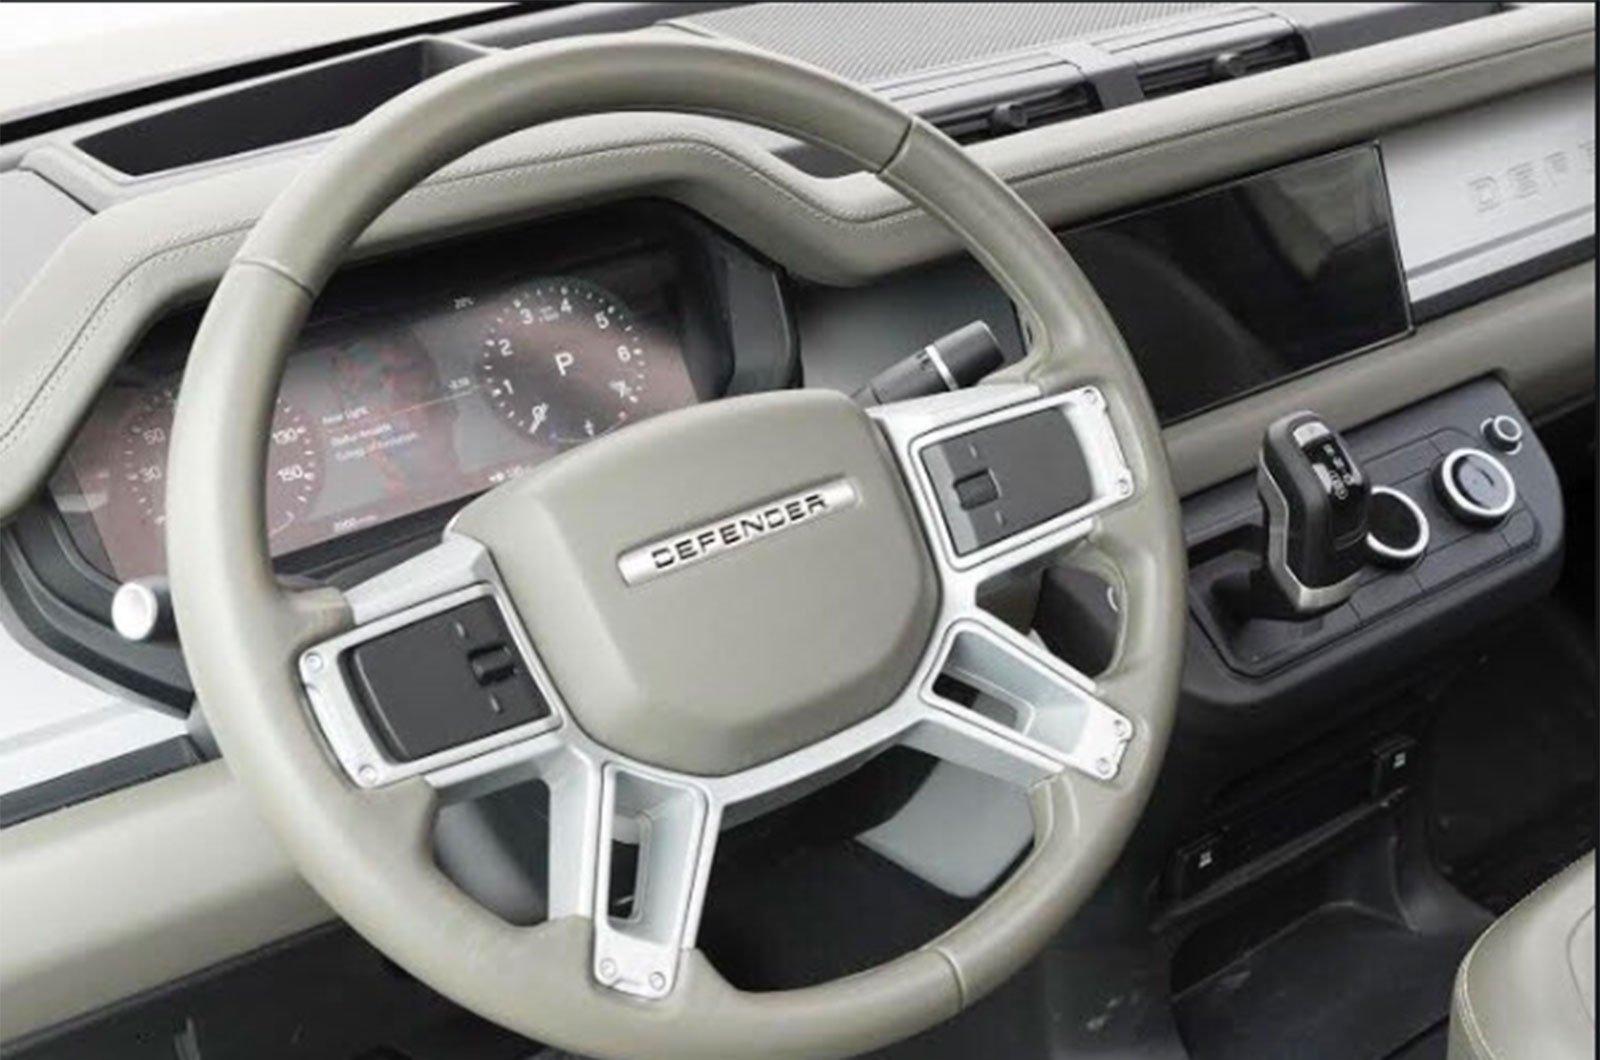 2020 Land Rover Defender leaked interior image